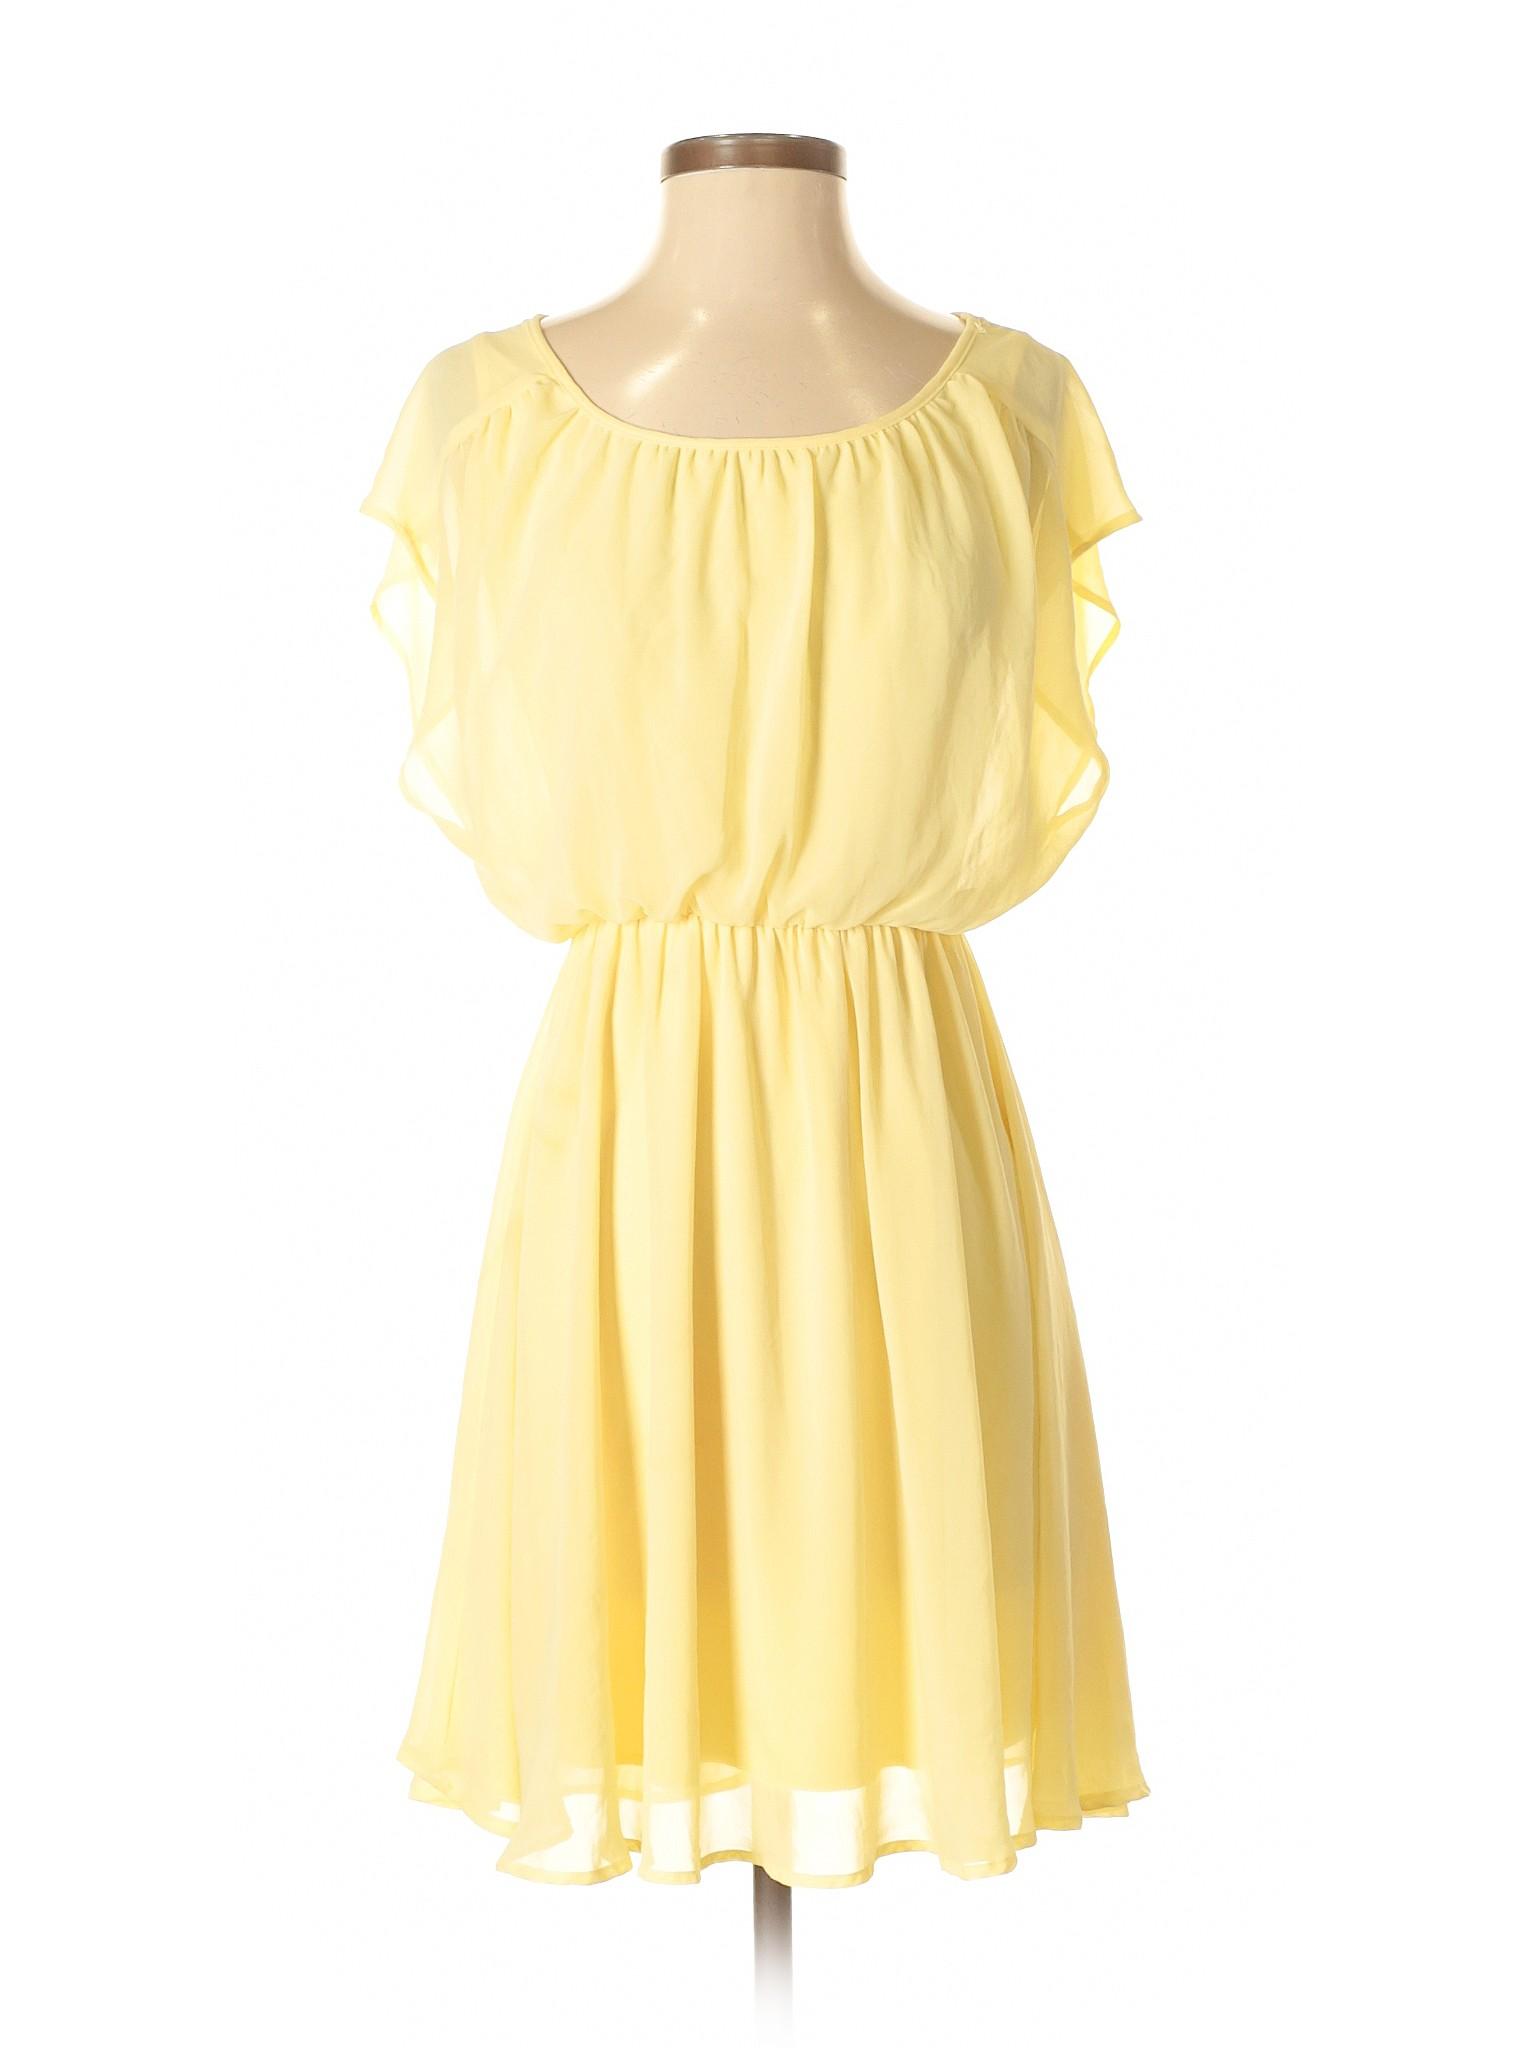 Dress Casual Alya Boutique winter Casual Dress Boutique winter Boutique Casual Alya Alya Dress winter RqOT4dxO